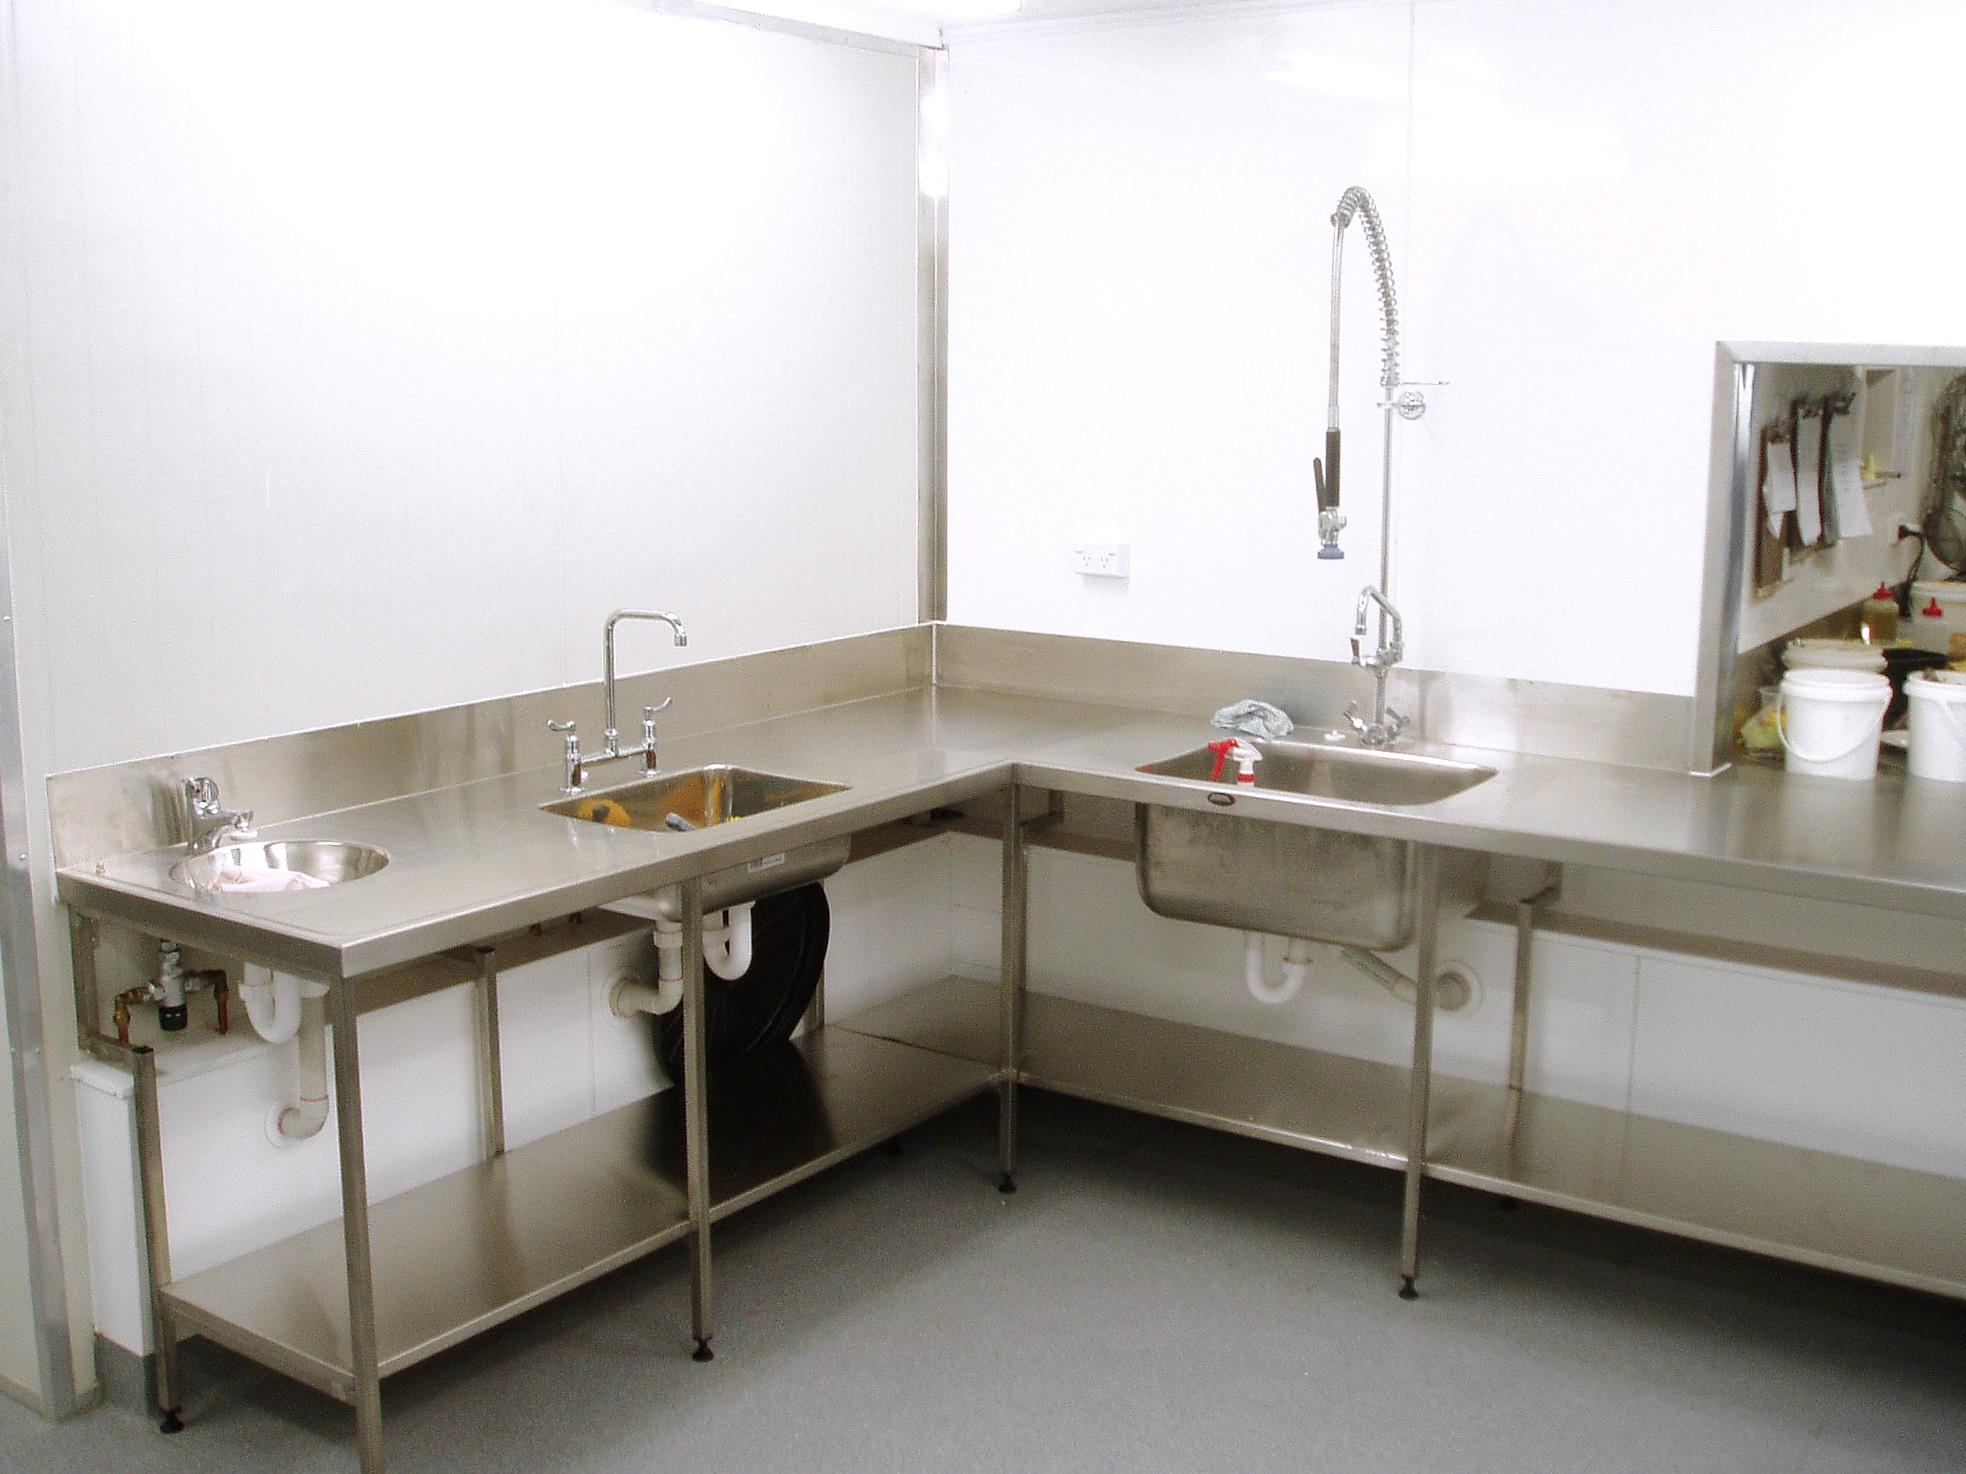 8b commercial kitchen.jpg